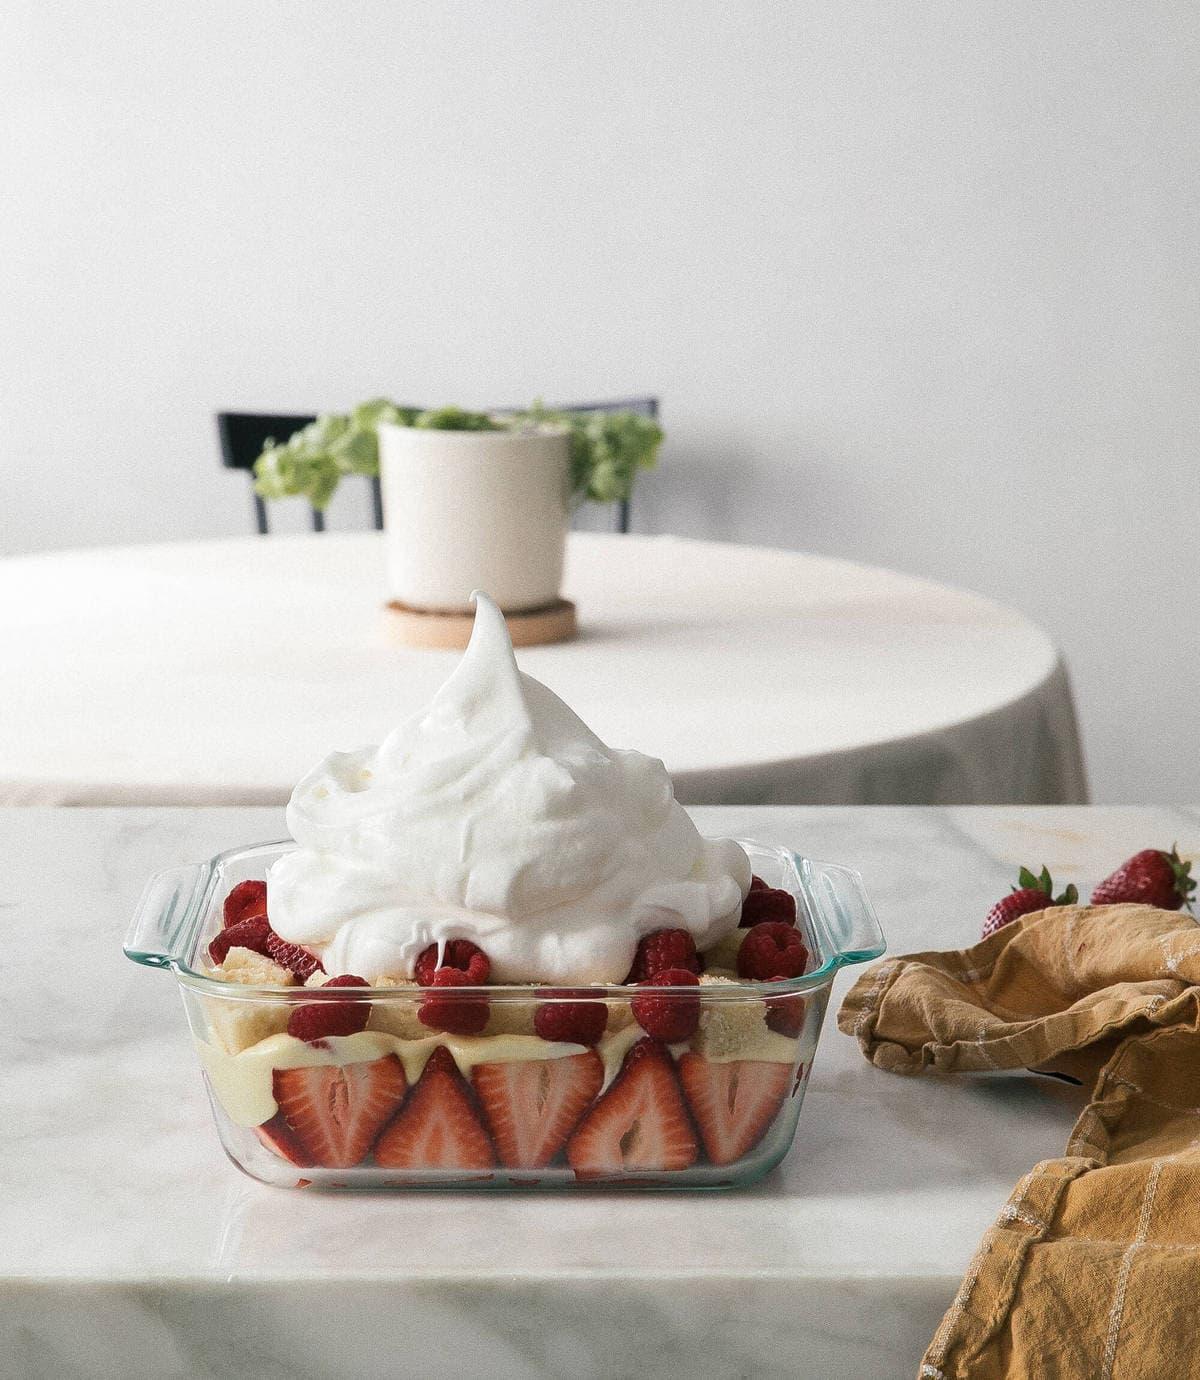 Lemon Berry Meringue Trifle